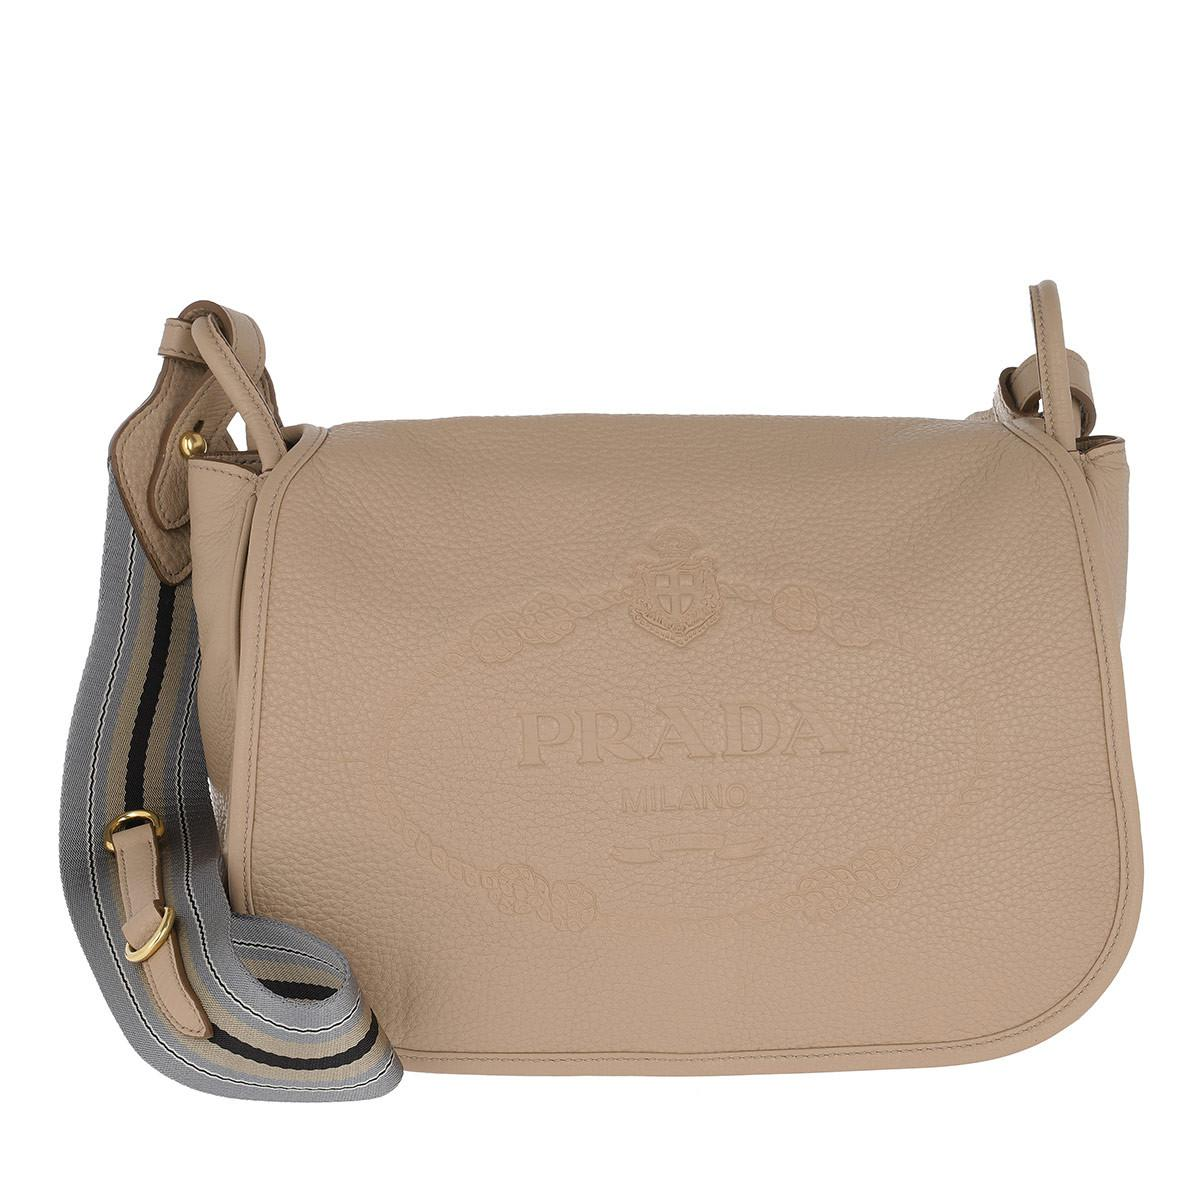 Cross Body Bags - Bandoliera Vitello Daino Cammeo - beige - Cross Body Bags for ladies Prada EYHb2k